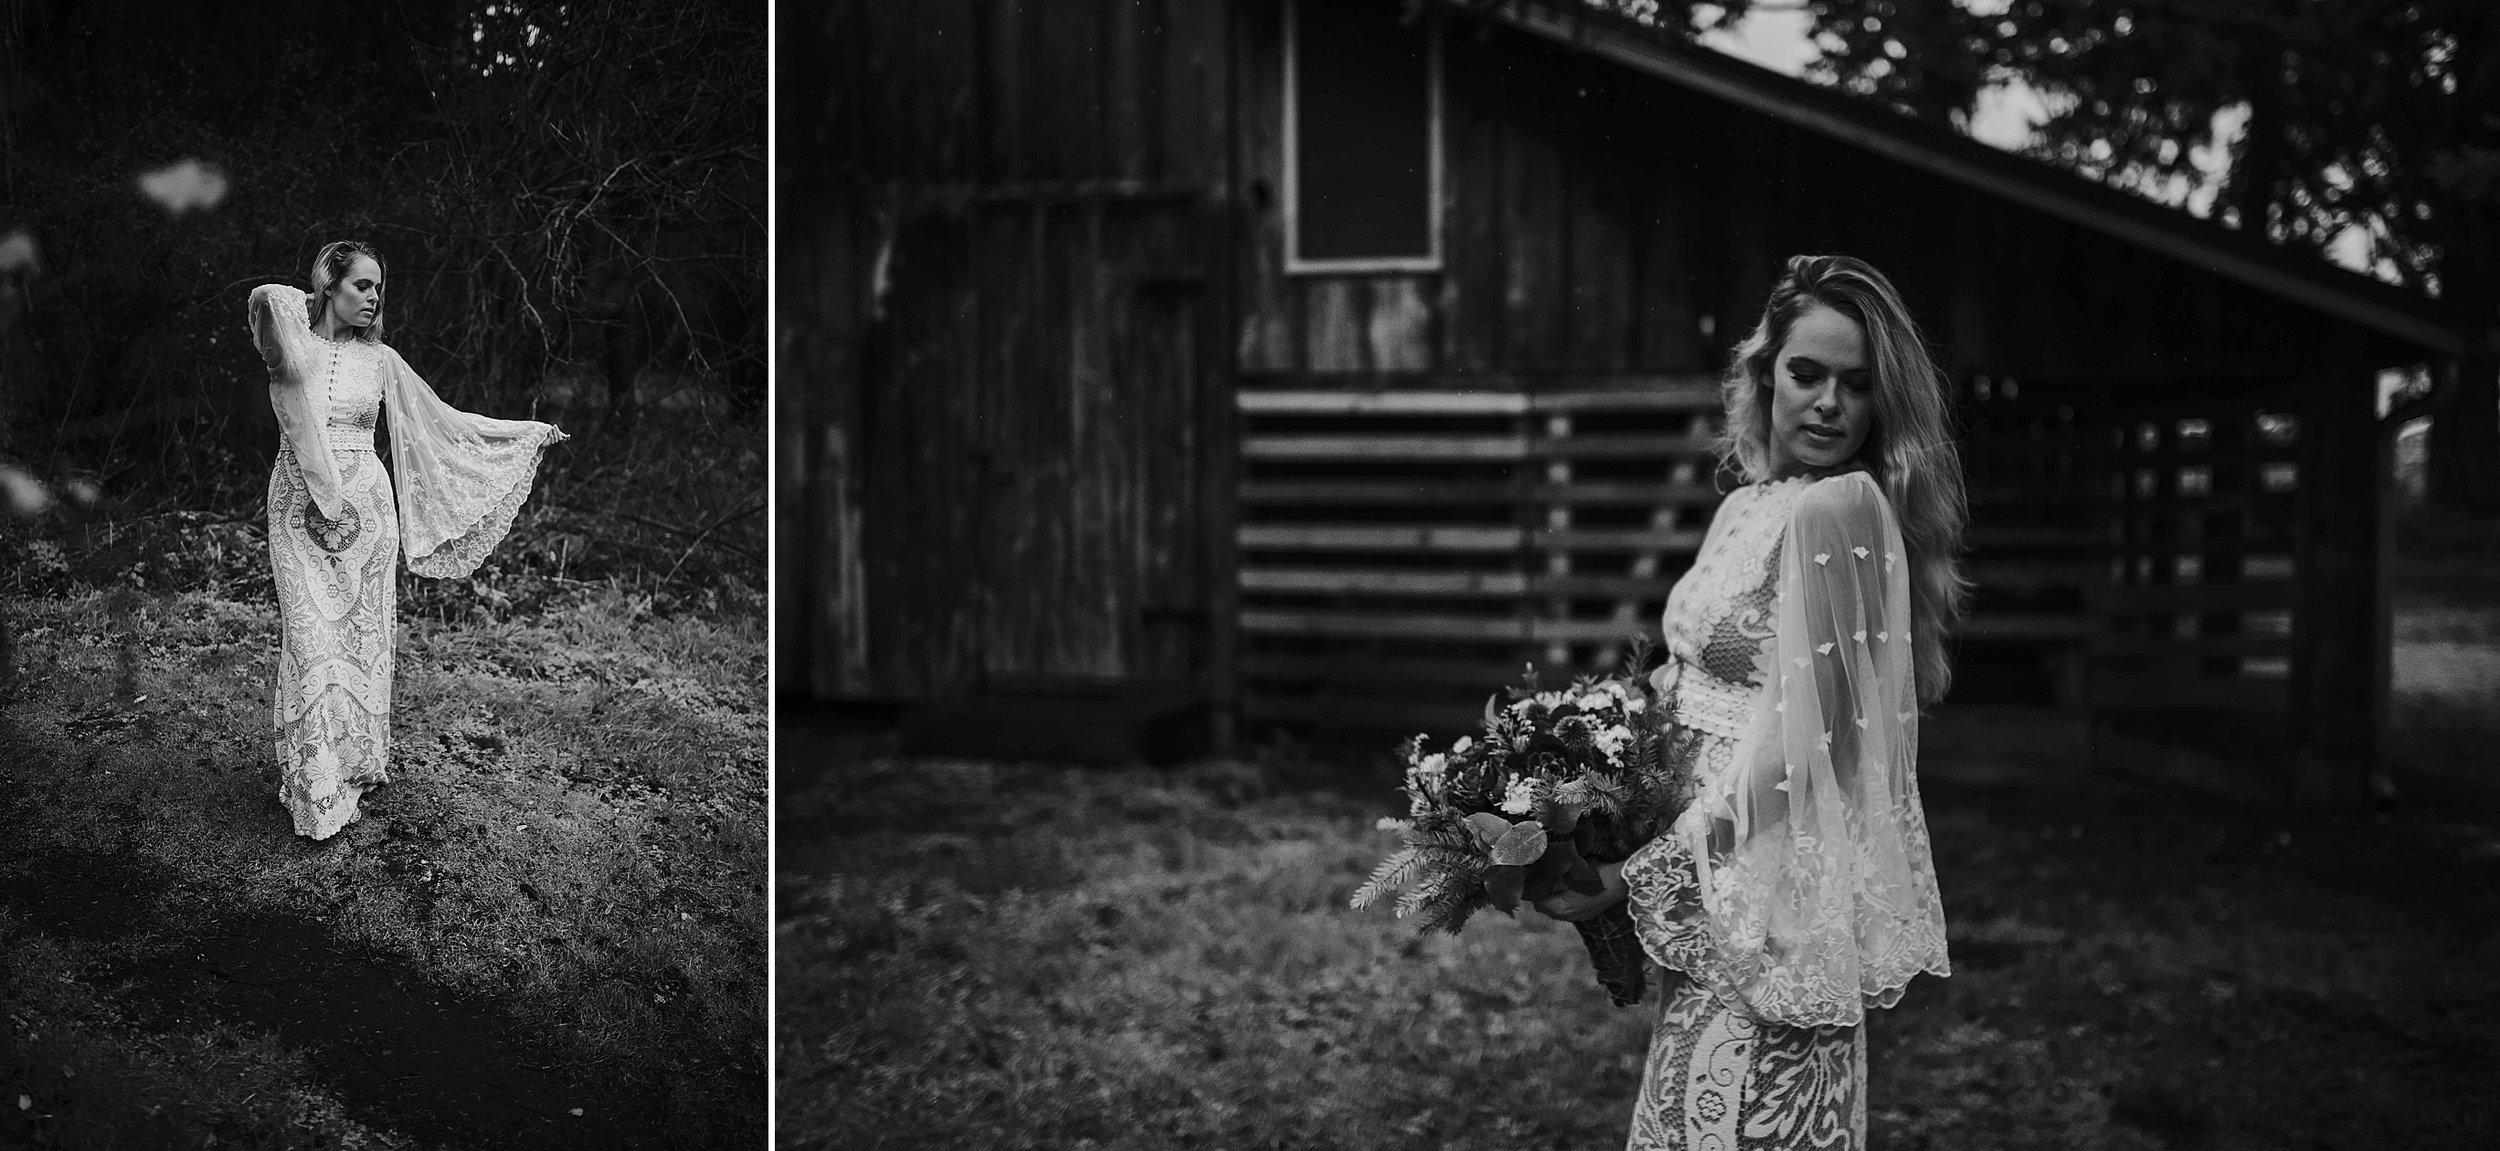 Wedding-photographer-J HODGES PHOTOGRAPHY_0215.jpg